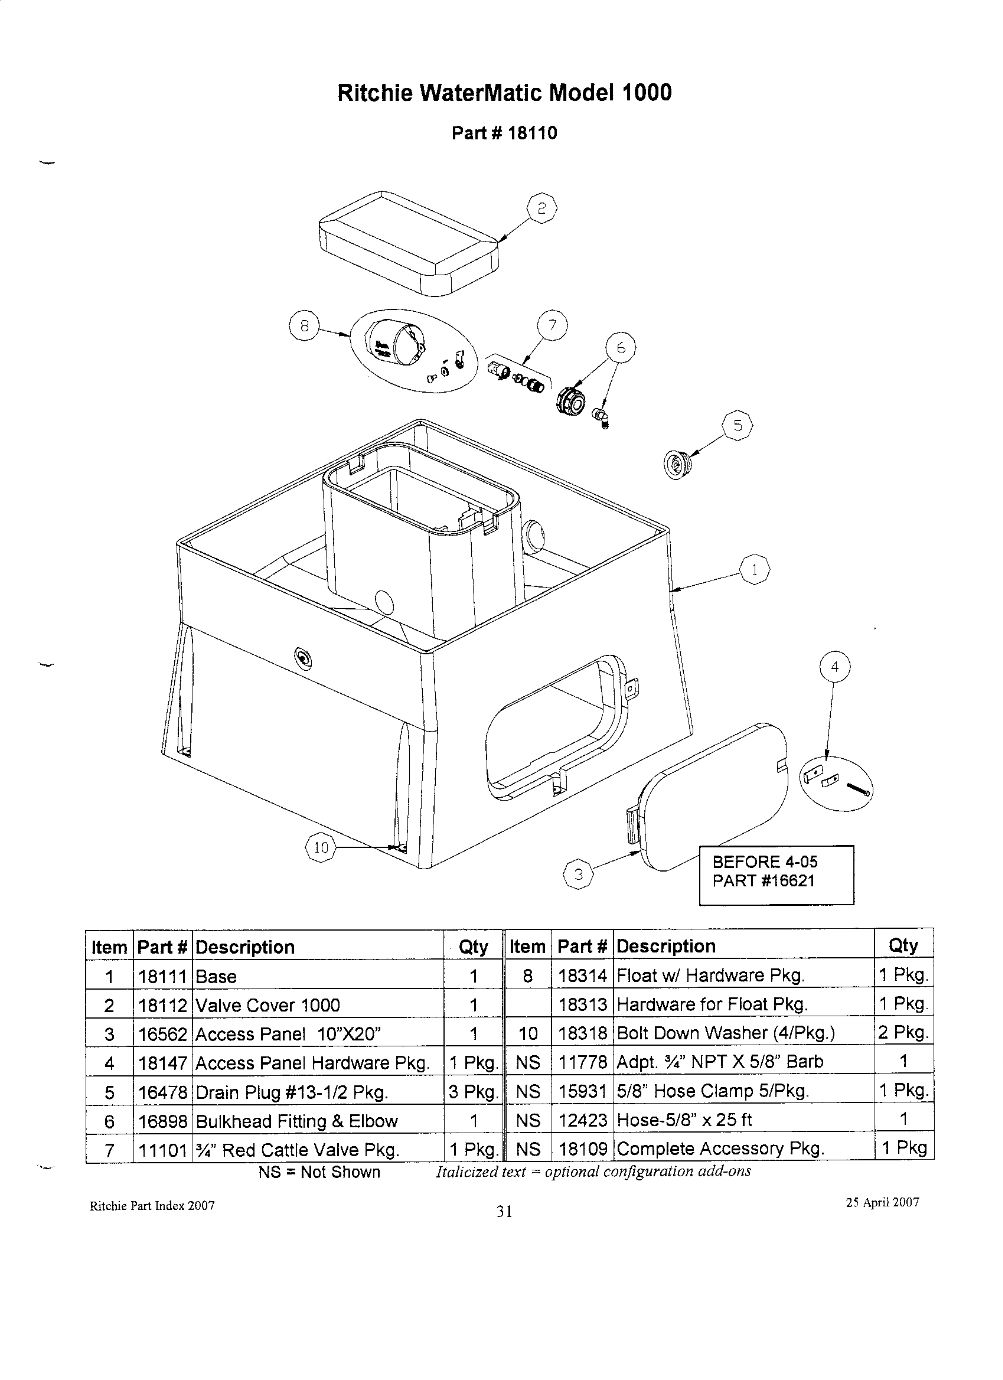 Watermatic 1000 Parts